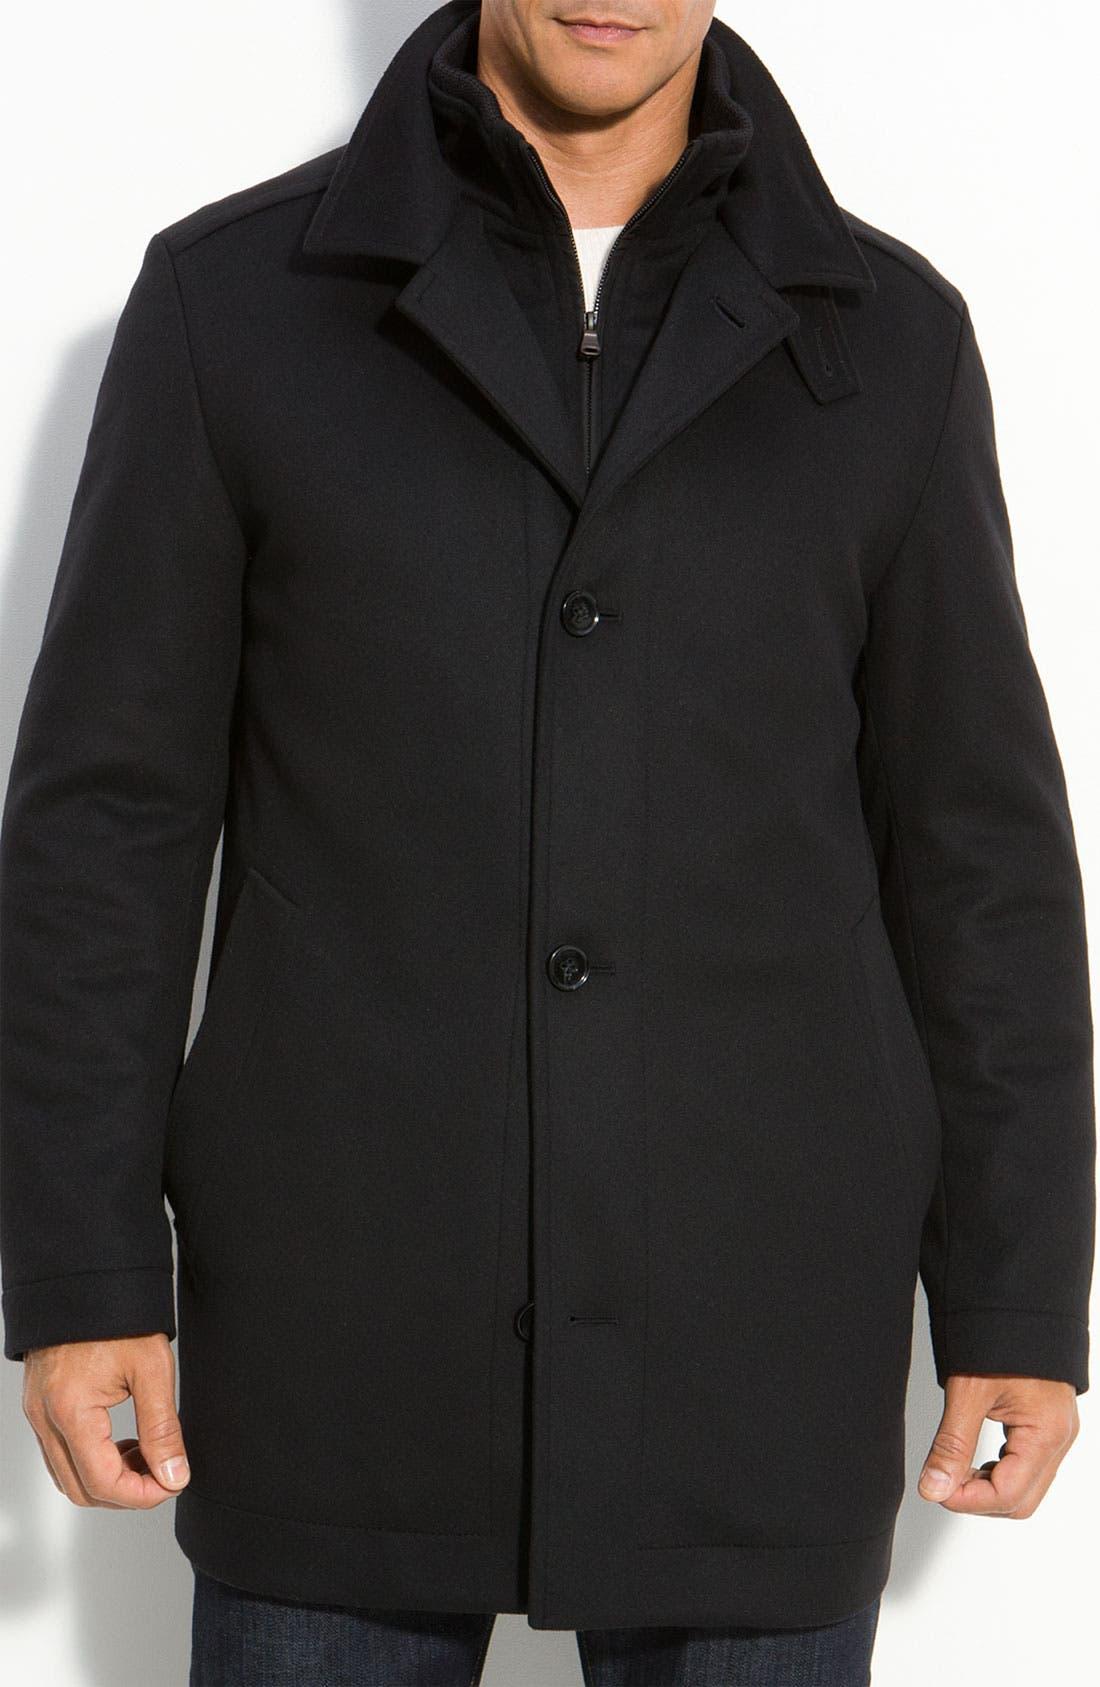 Main Image - BOSS HUGO BOSS 'Coxtan' Wool & Cashmere Coat